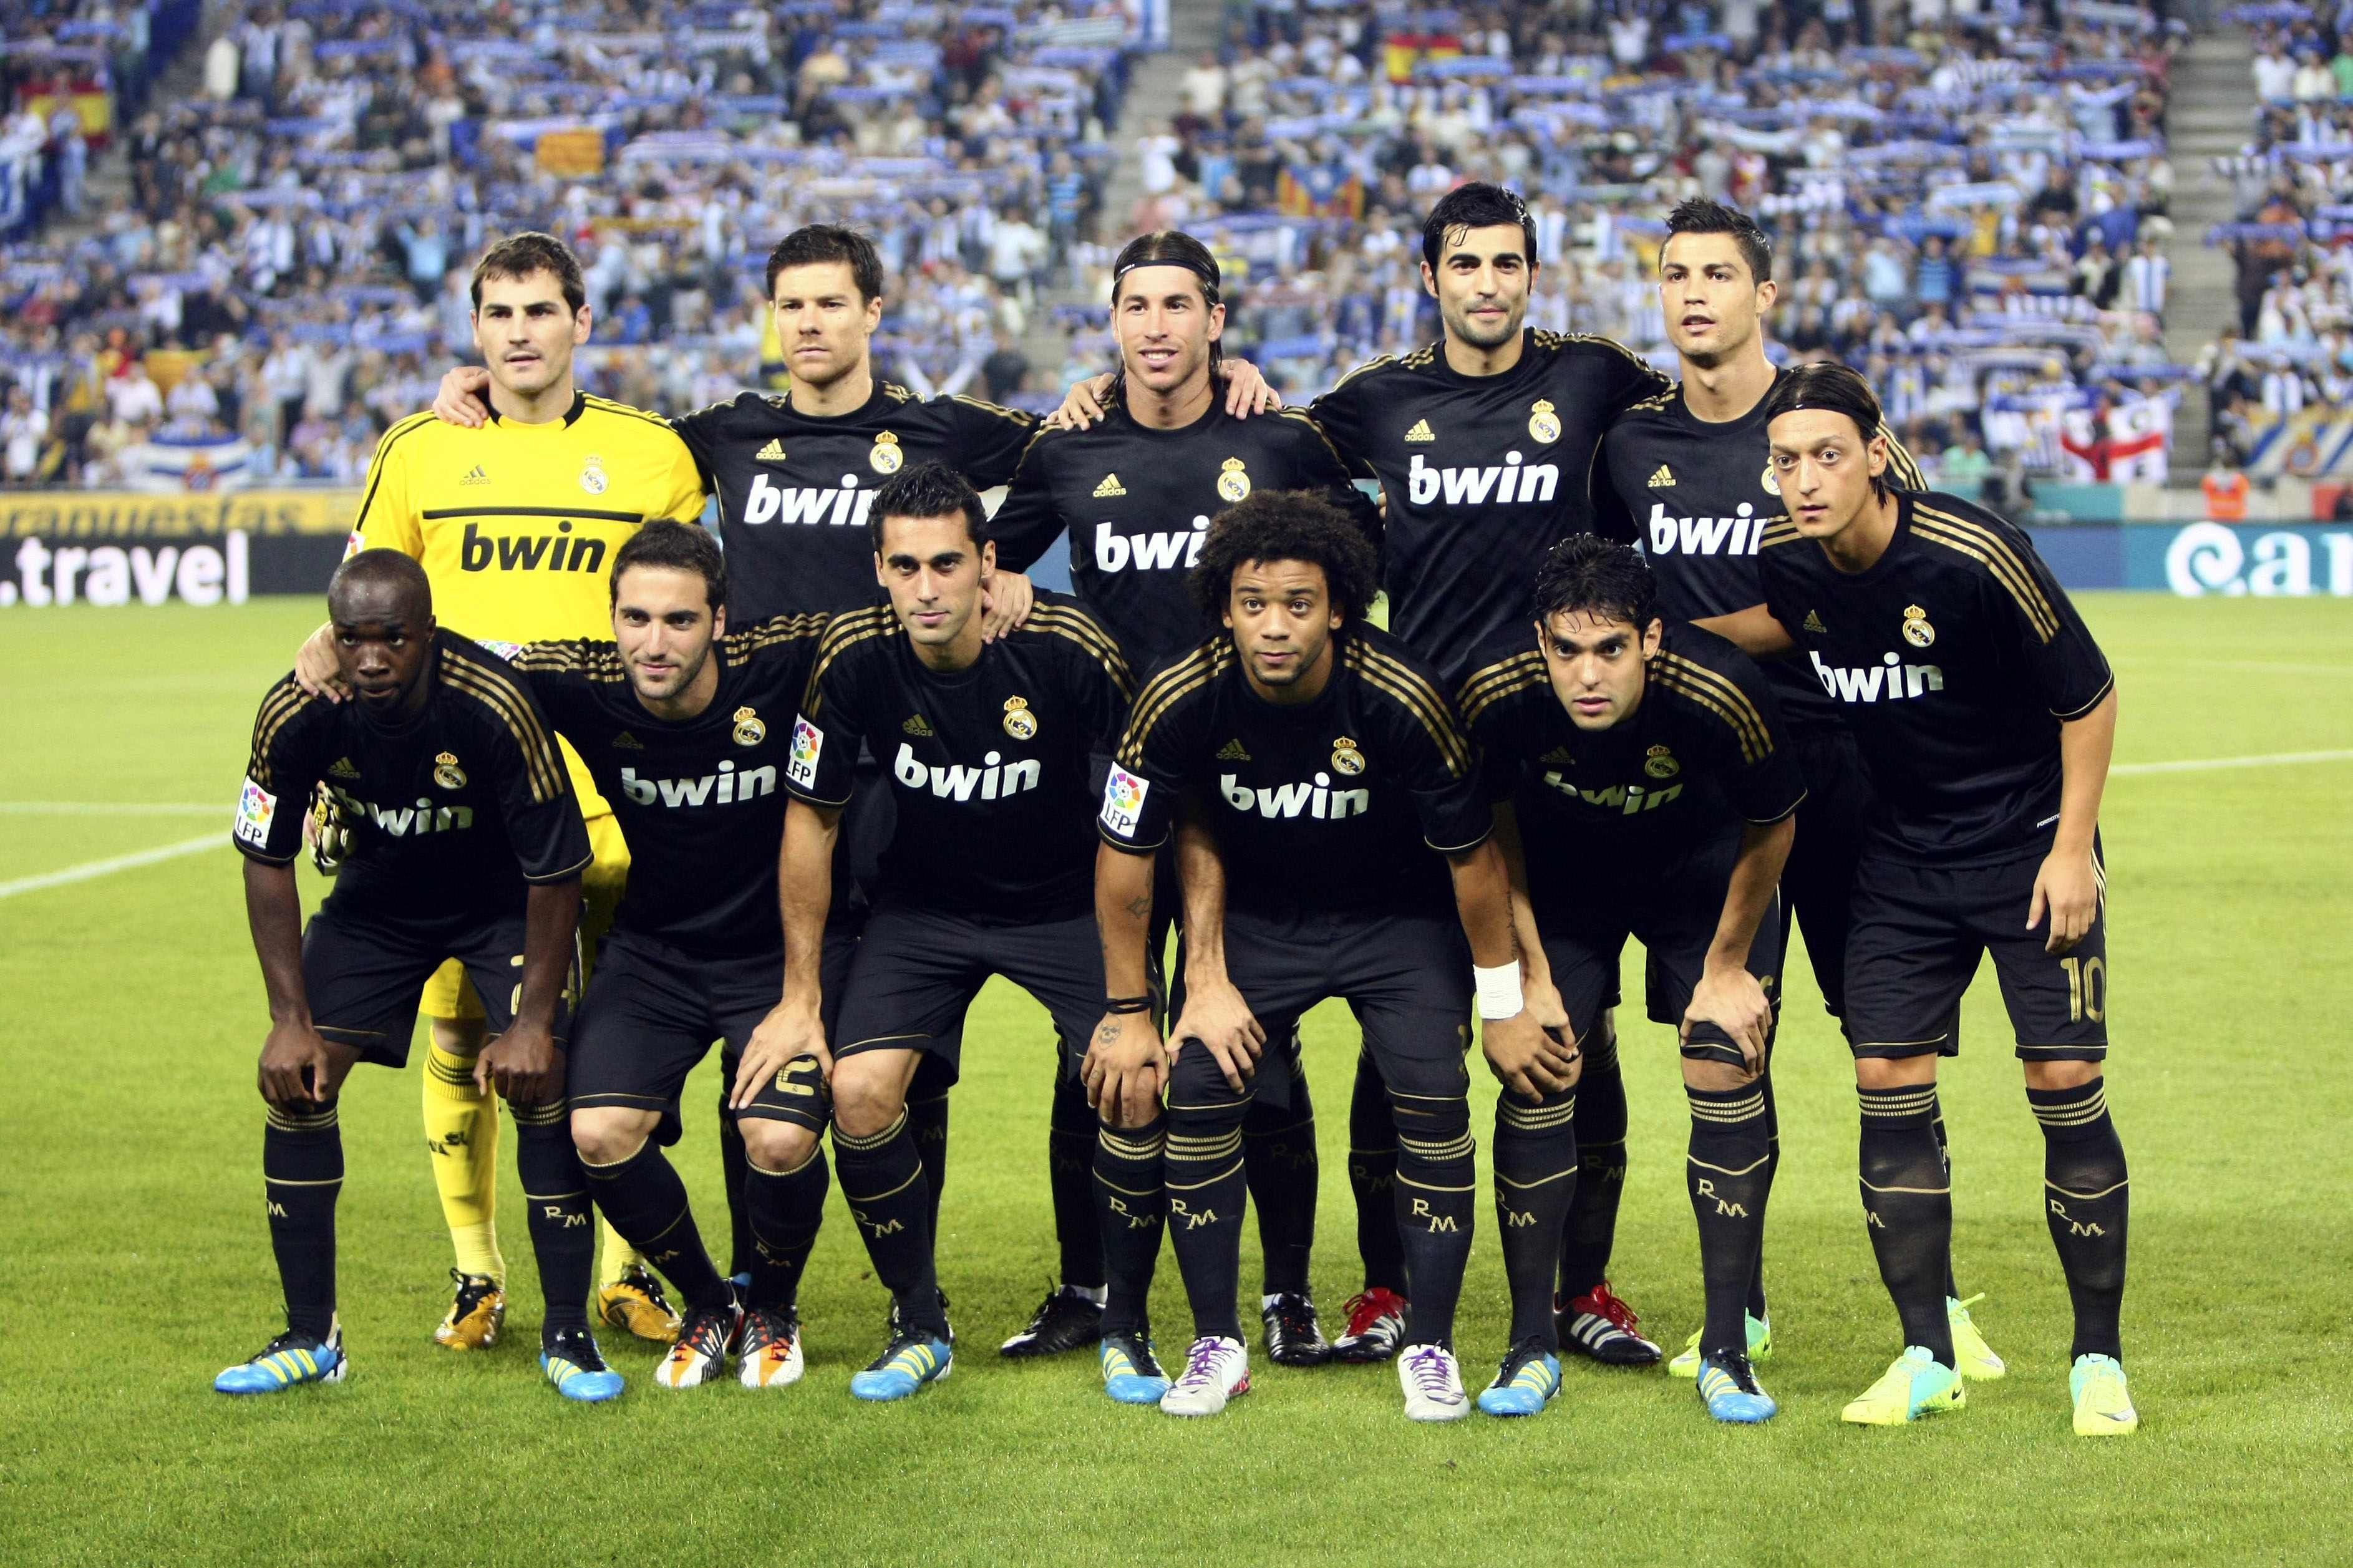 12 13 Season Champions Real Madrid Wallpapers Real Madrid Madrid Football Club